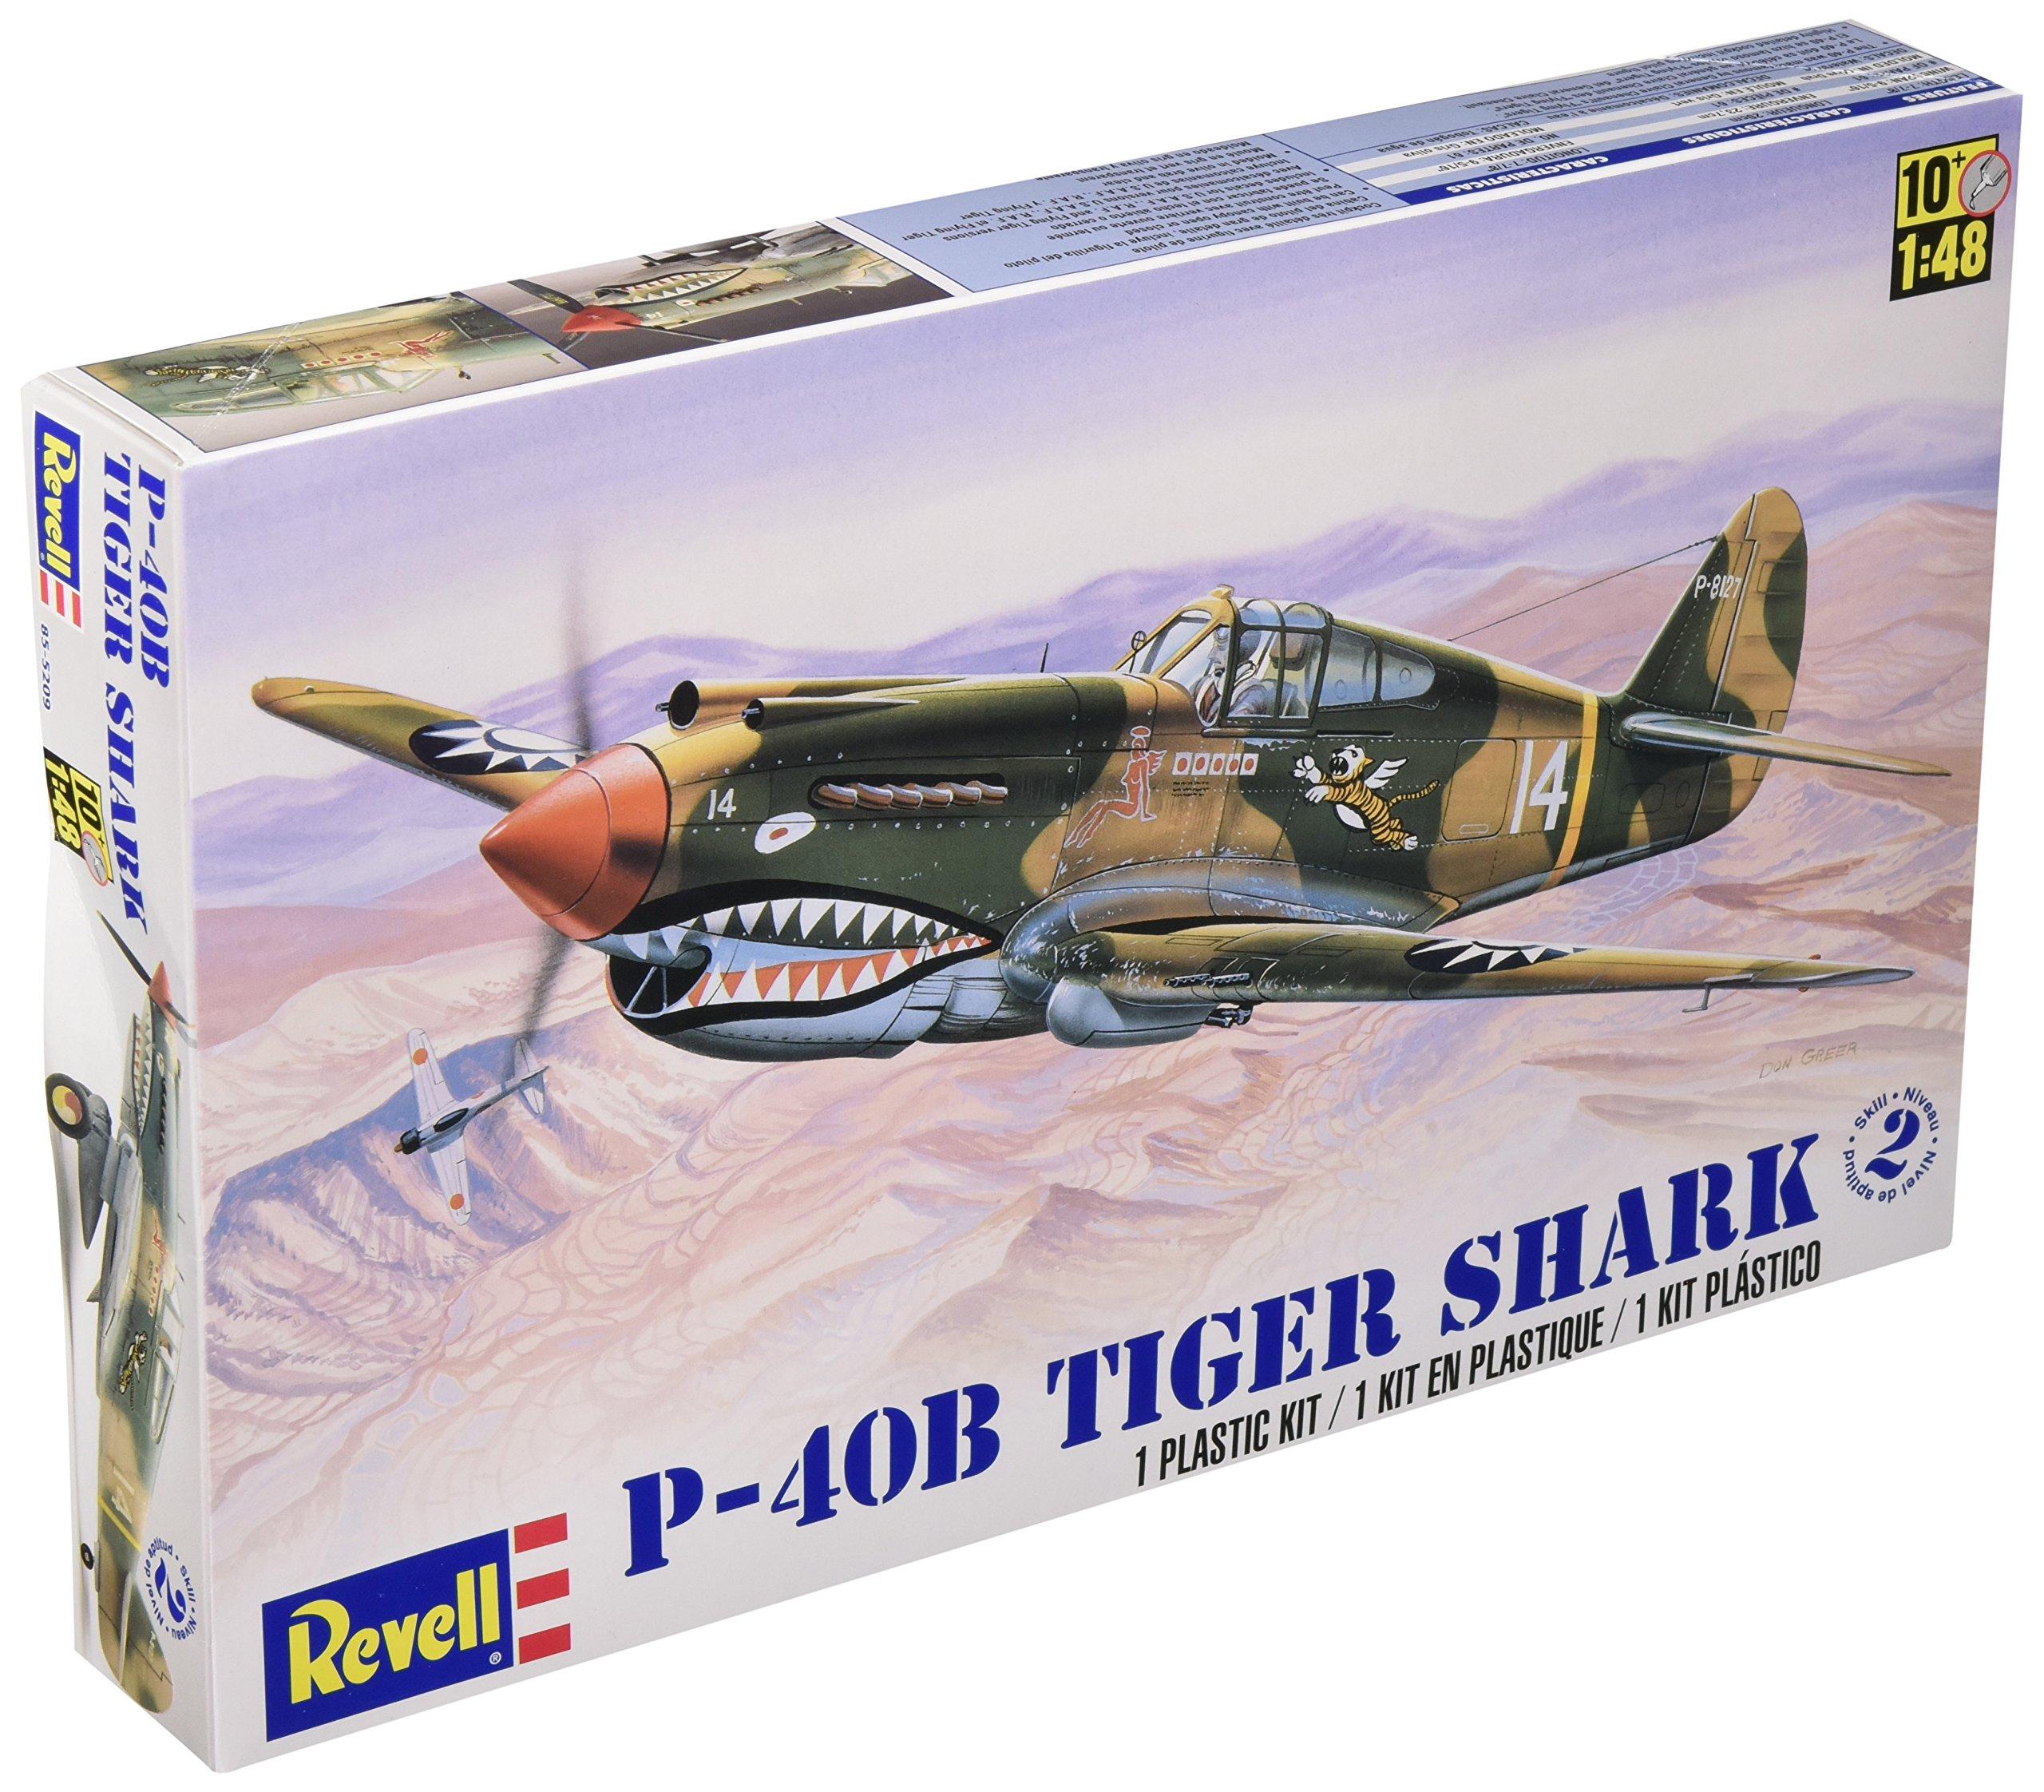 Revell Tiger Shark Plastic Model